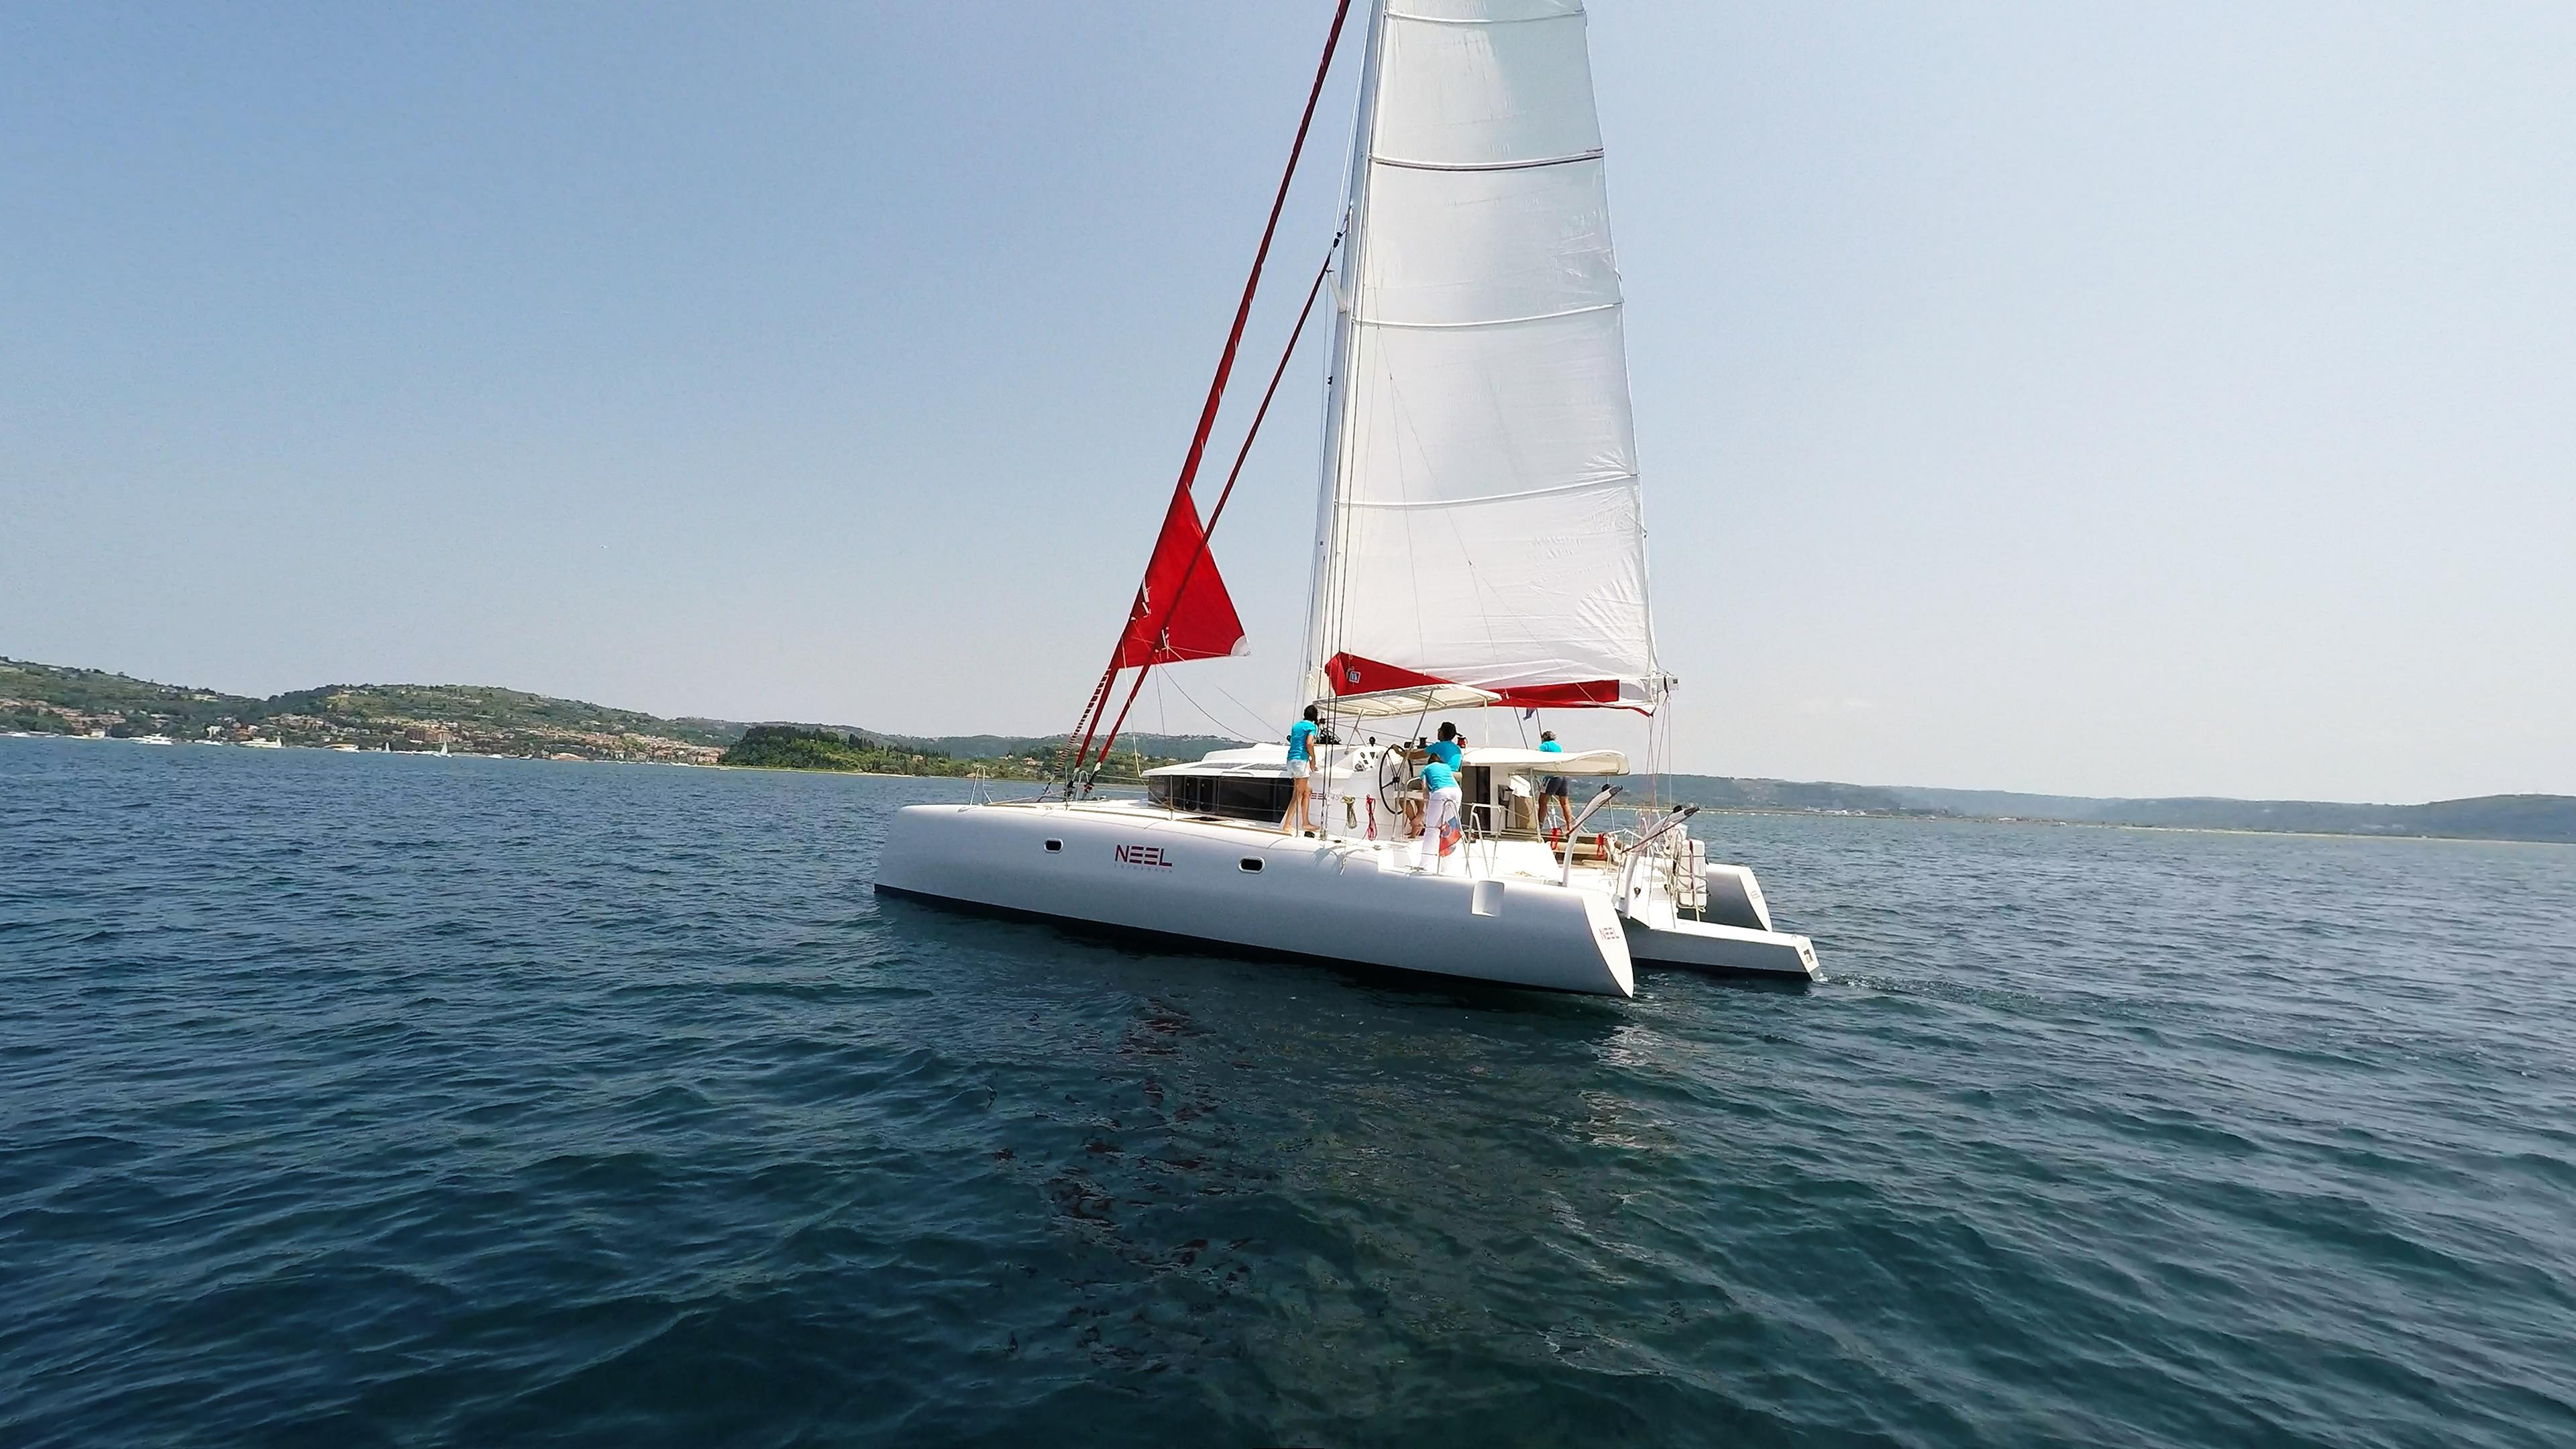 trimaran neel 45 hoisting gennaker sail